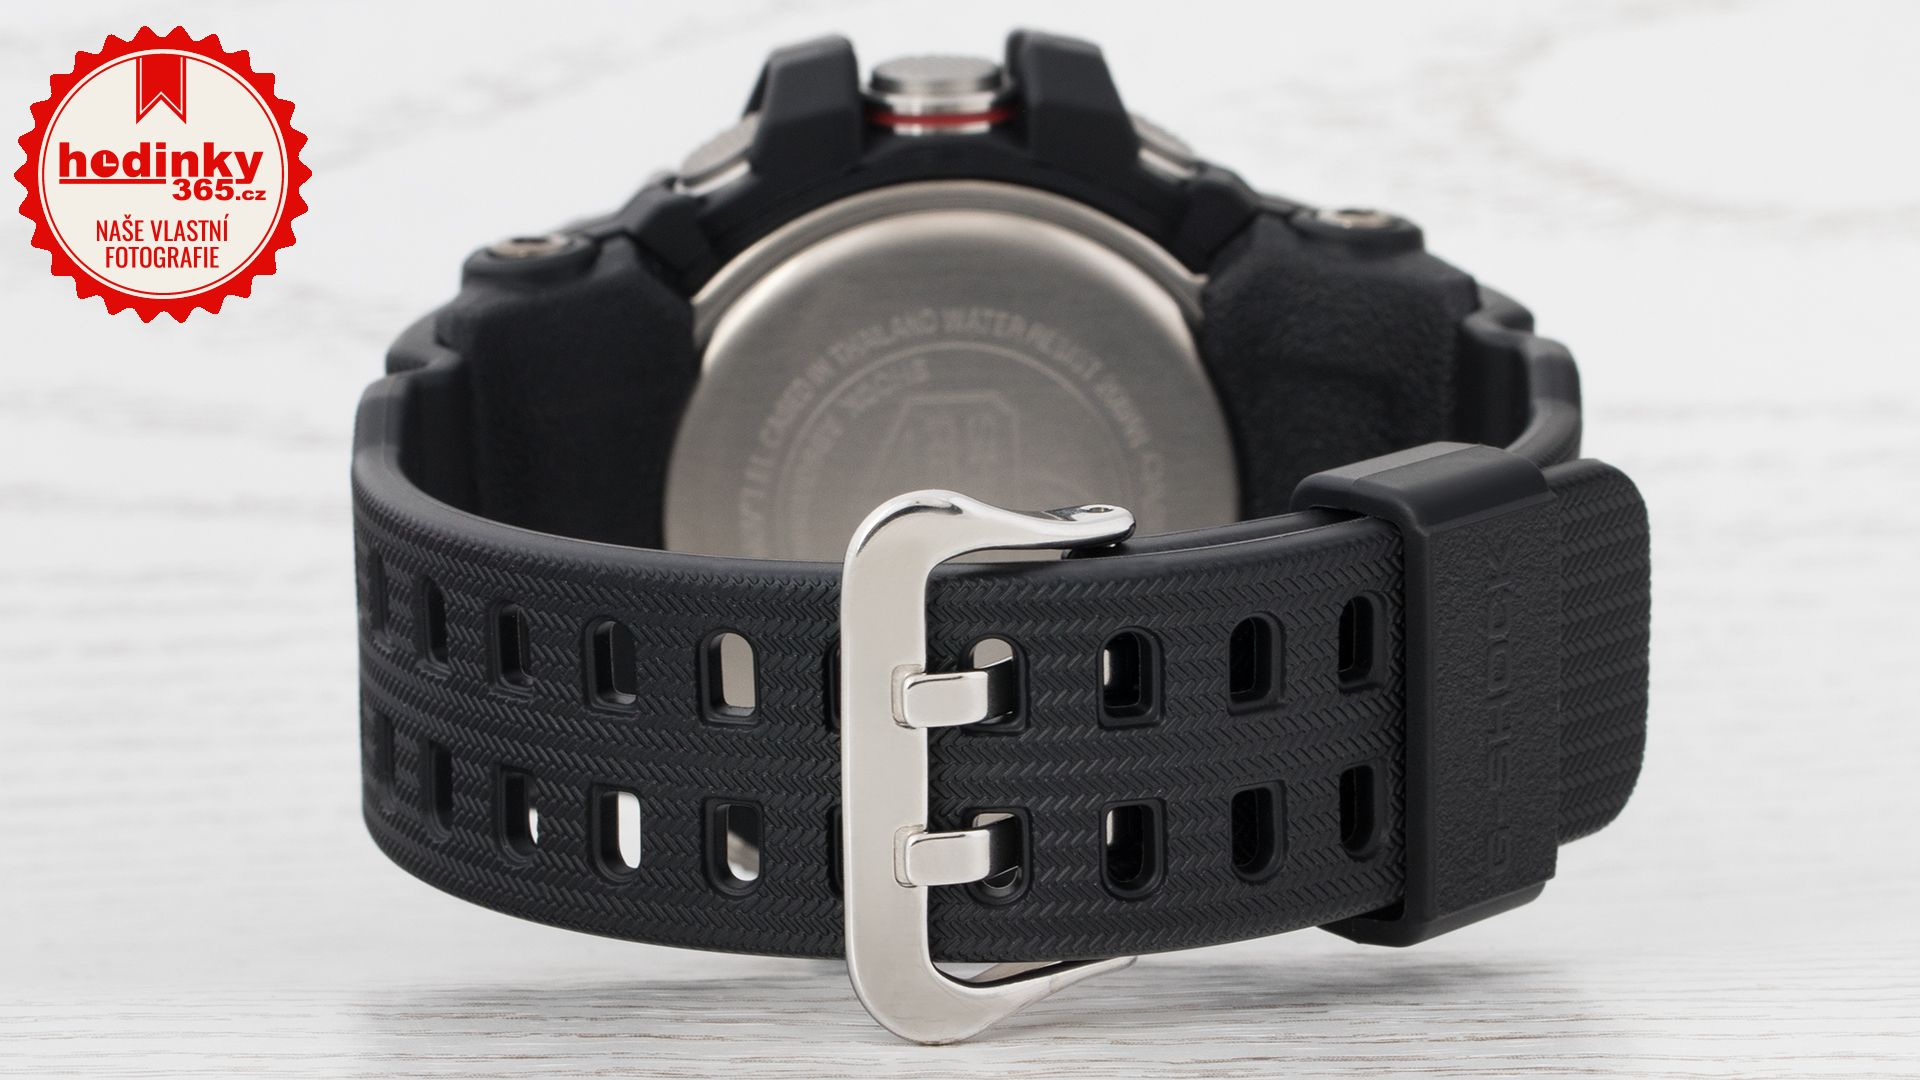 Casio G-Shock Mudmaster GG-1000-1AER. Hodnocení  5 8977d34faa9